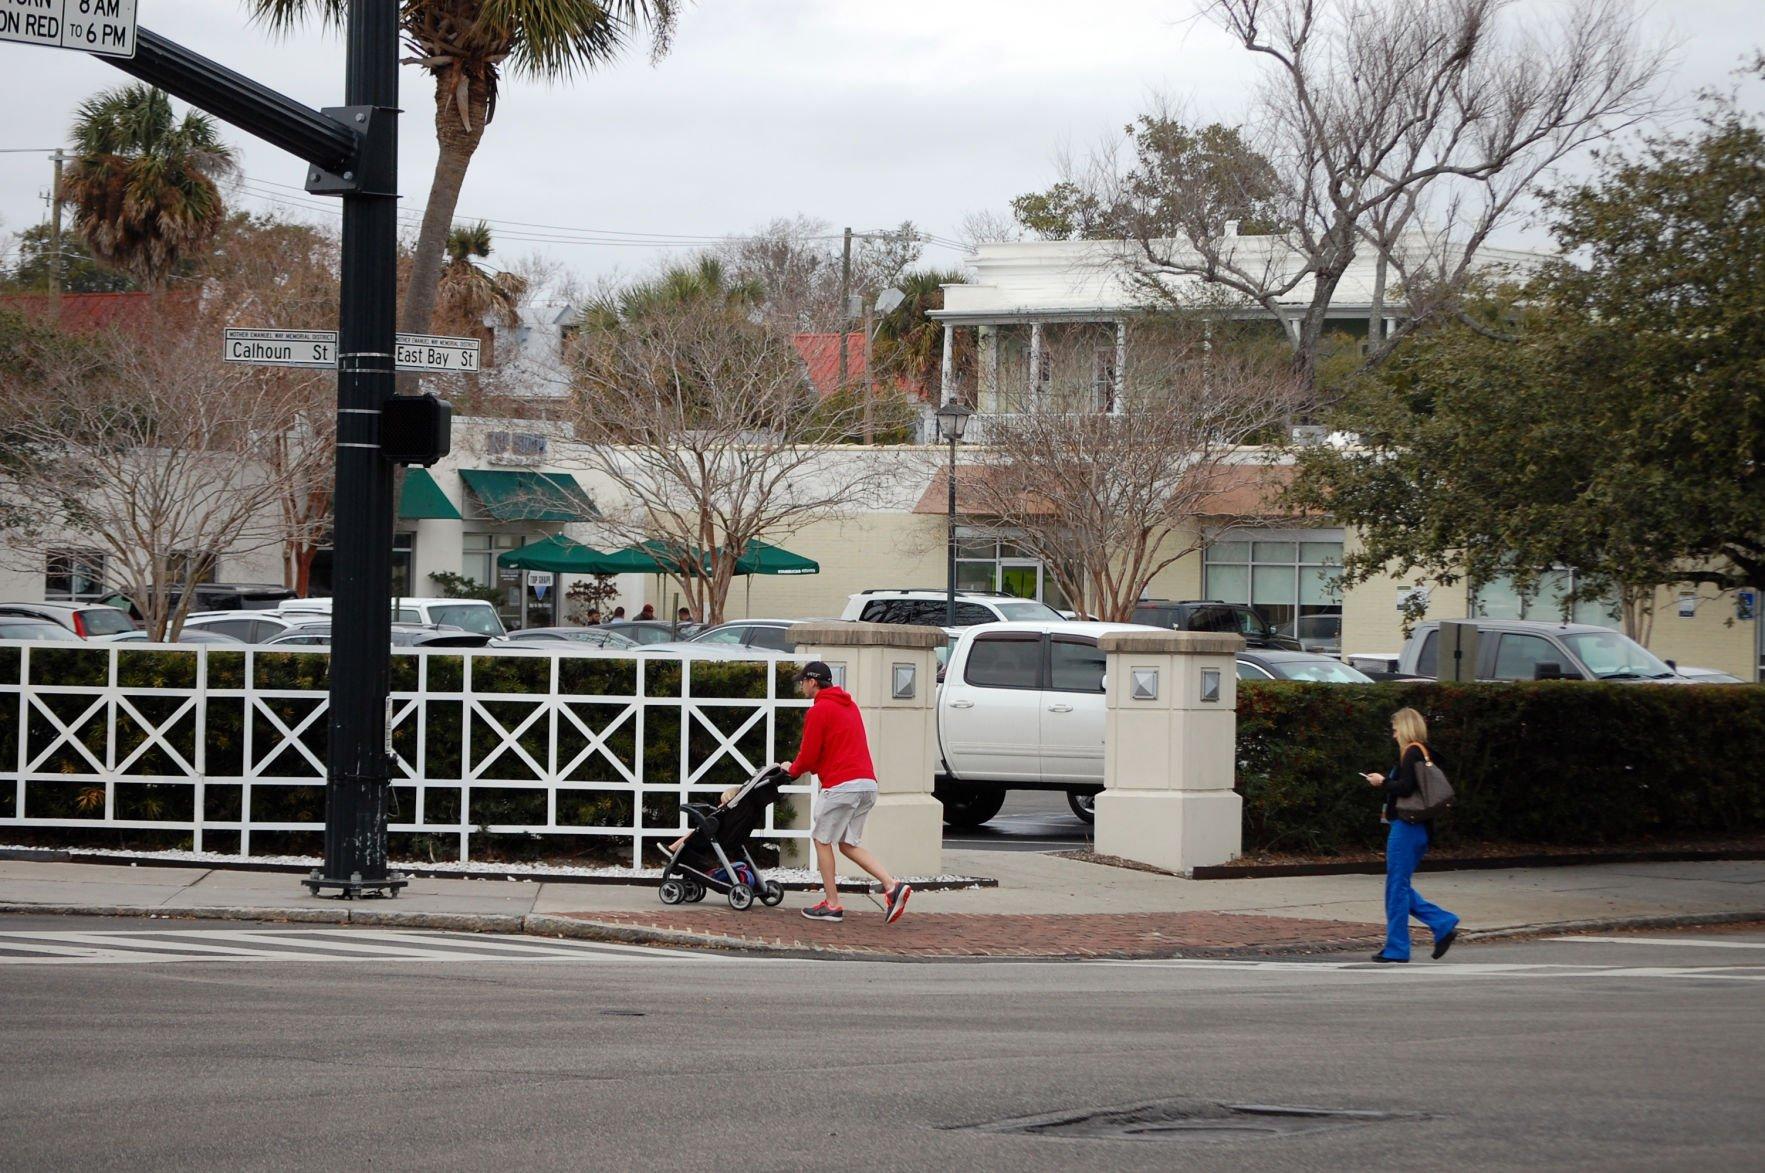 Physical Map Of South Carolina%0A Hotel plans for Starbucks Calhoun East Bay